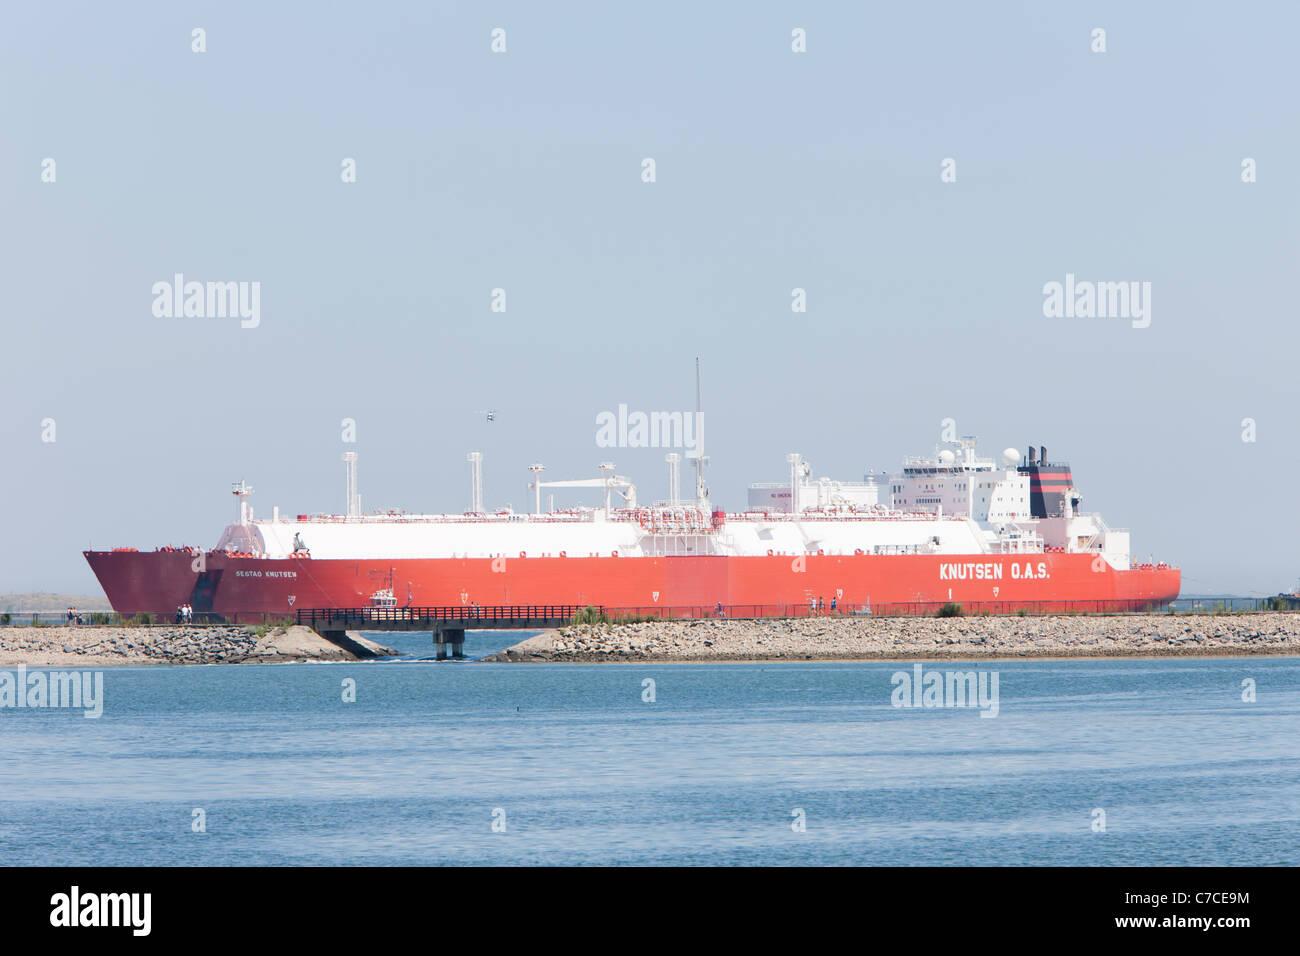 Knutsen OAS Shipping LNG tanker Sestao Knutsen enters Boston Harbor, passing the Pleasure Bay Loop Trail on Castle - Stock Image